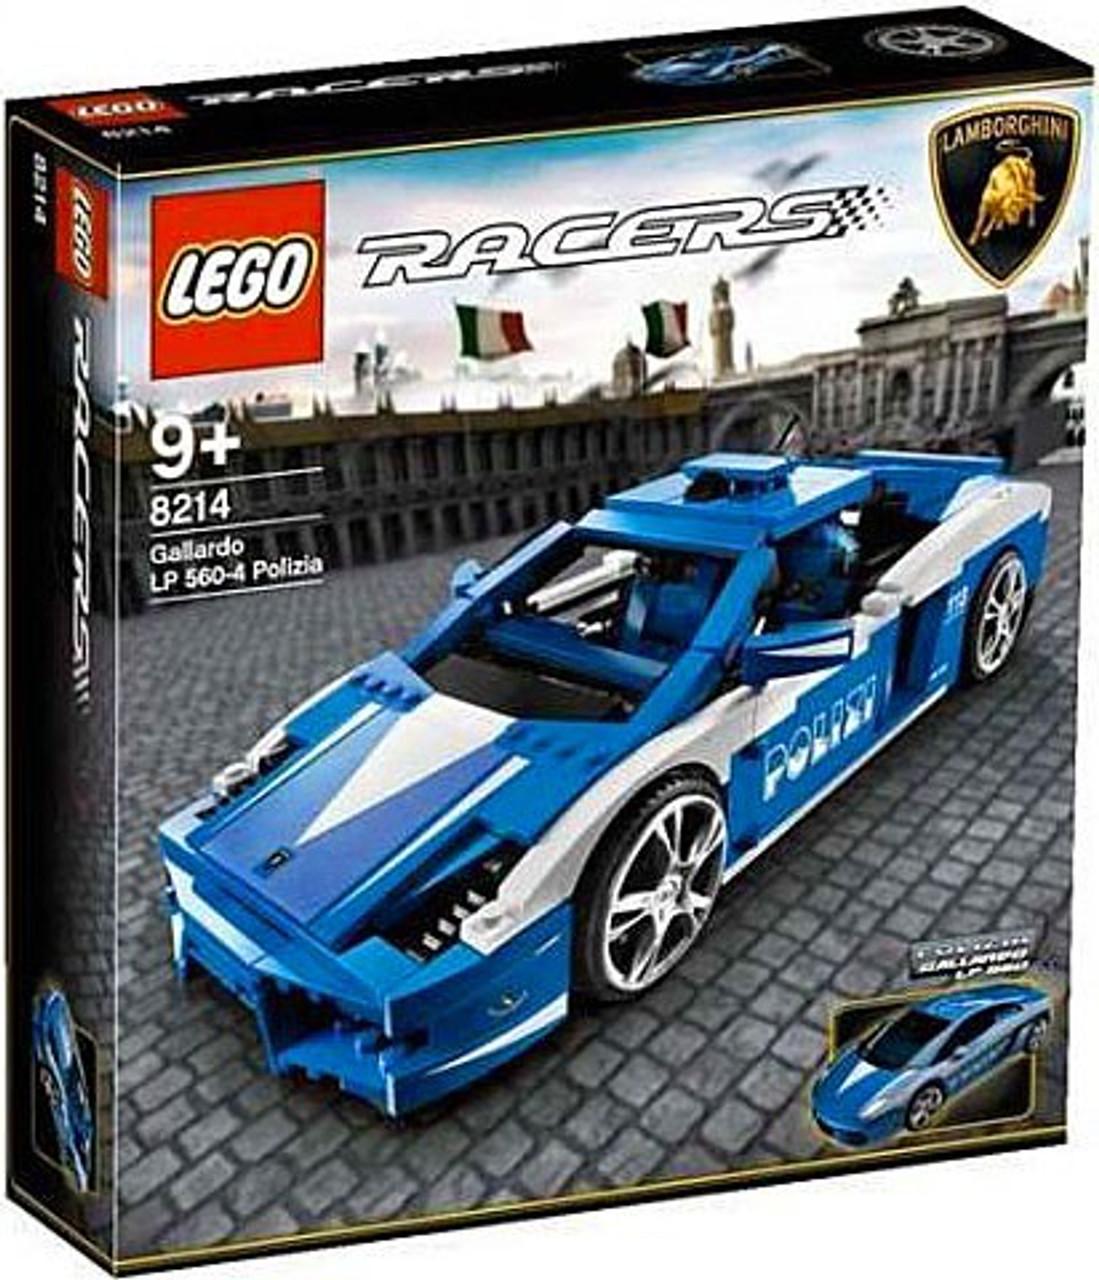 LEGO Racers Police Lamborghini Gallardo Exclusive Set 8214